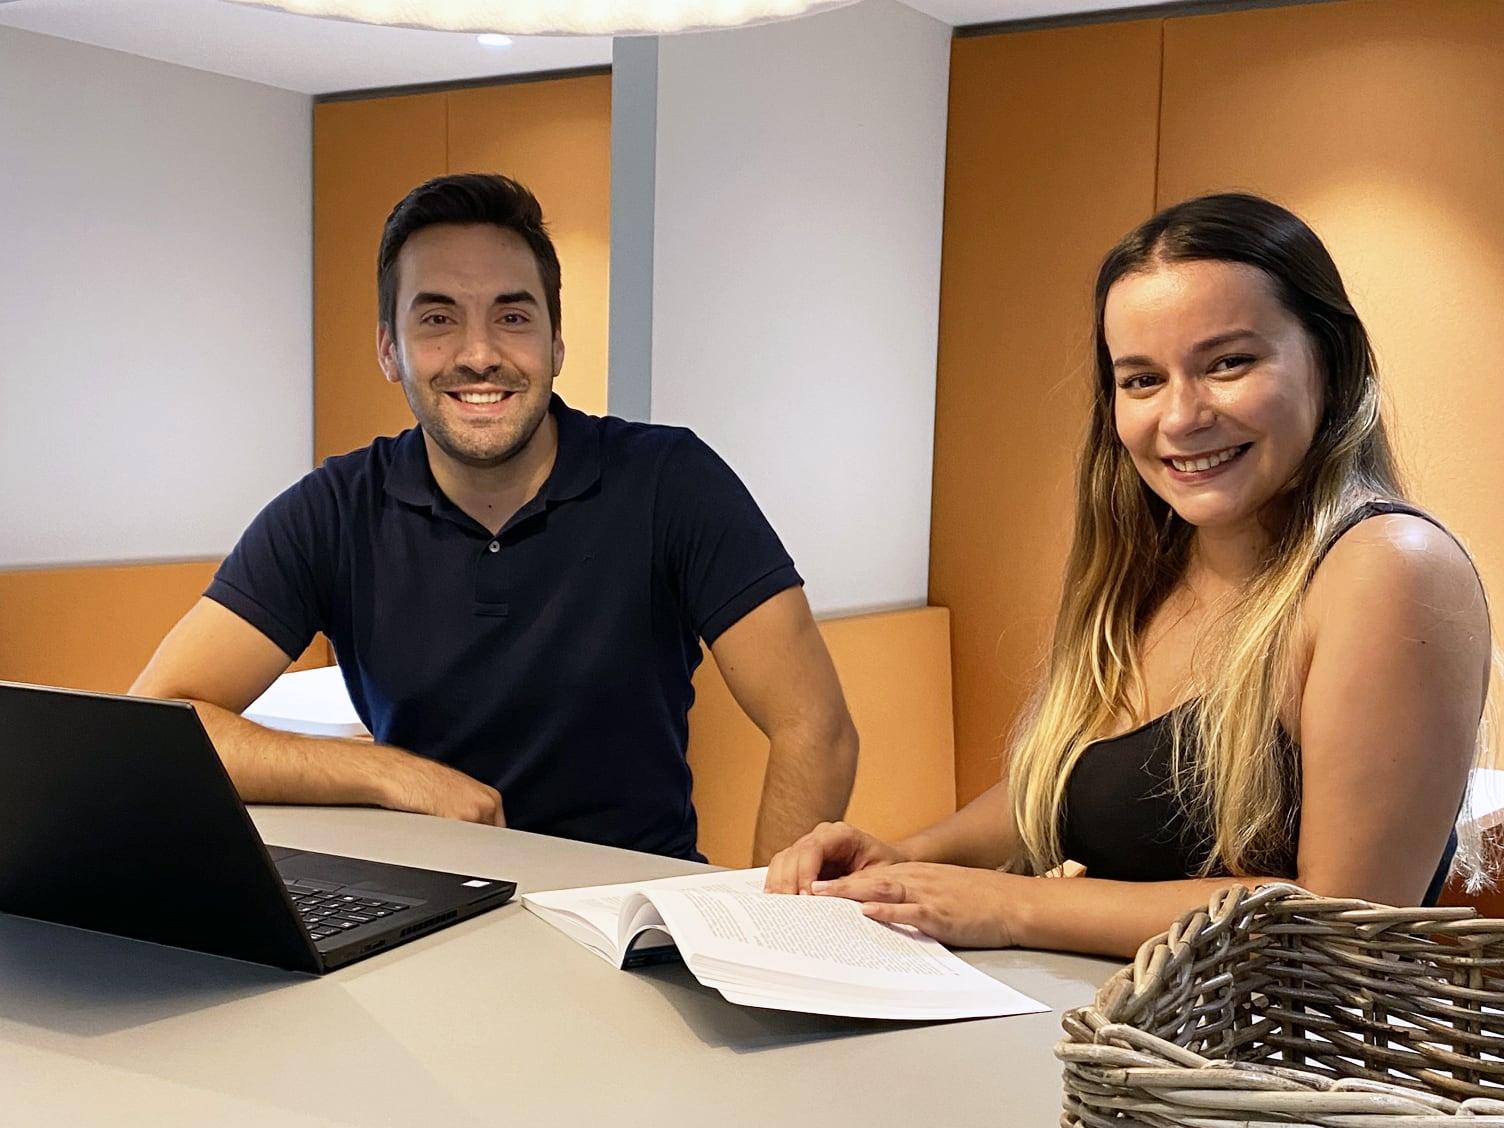 INSCALE Team Spirit - Collaboration at work